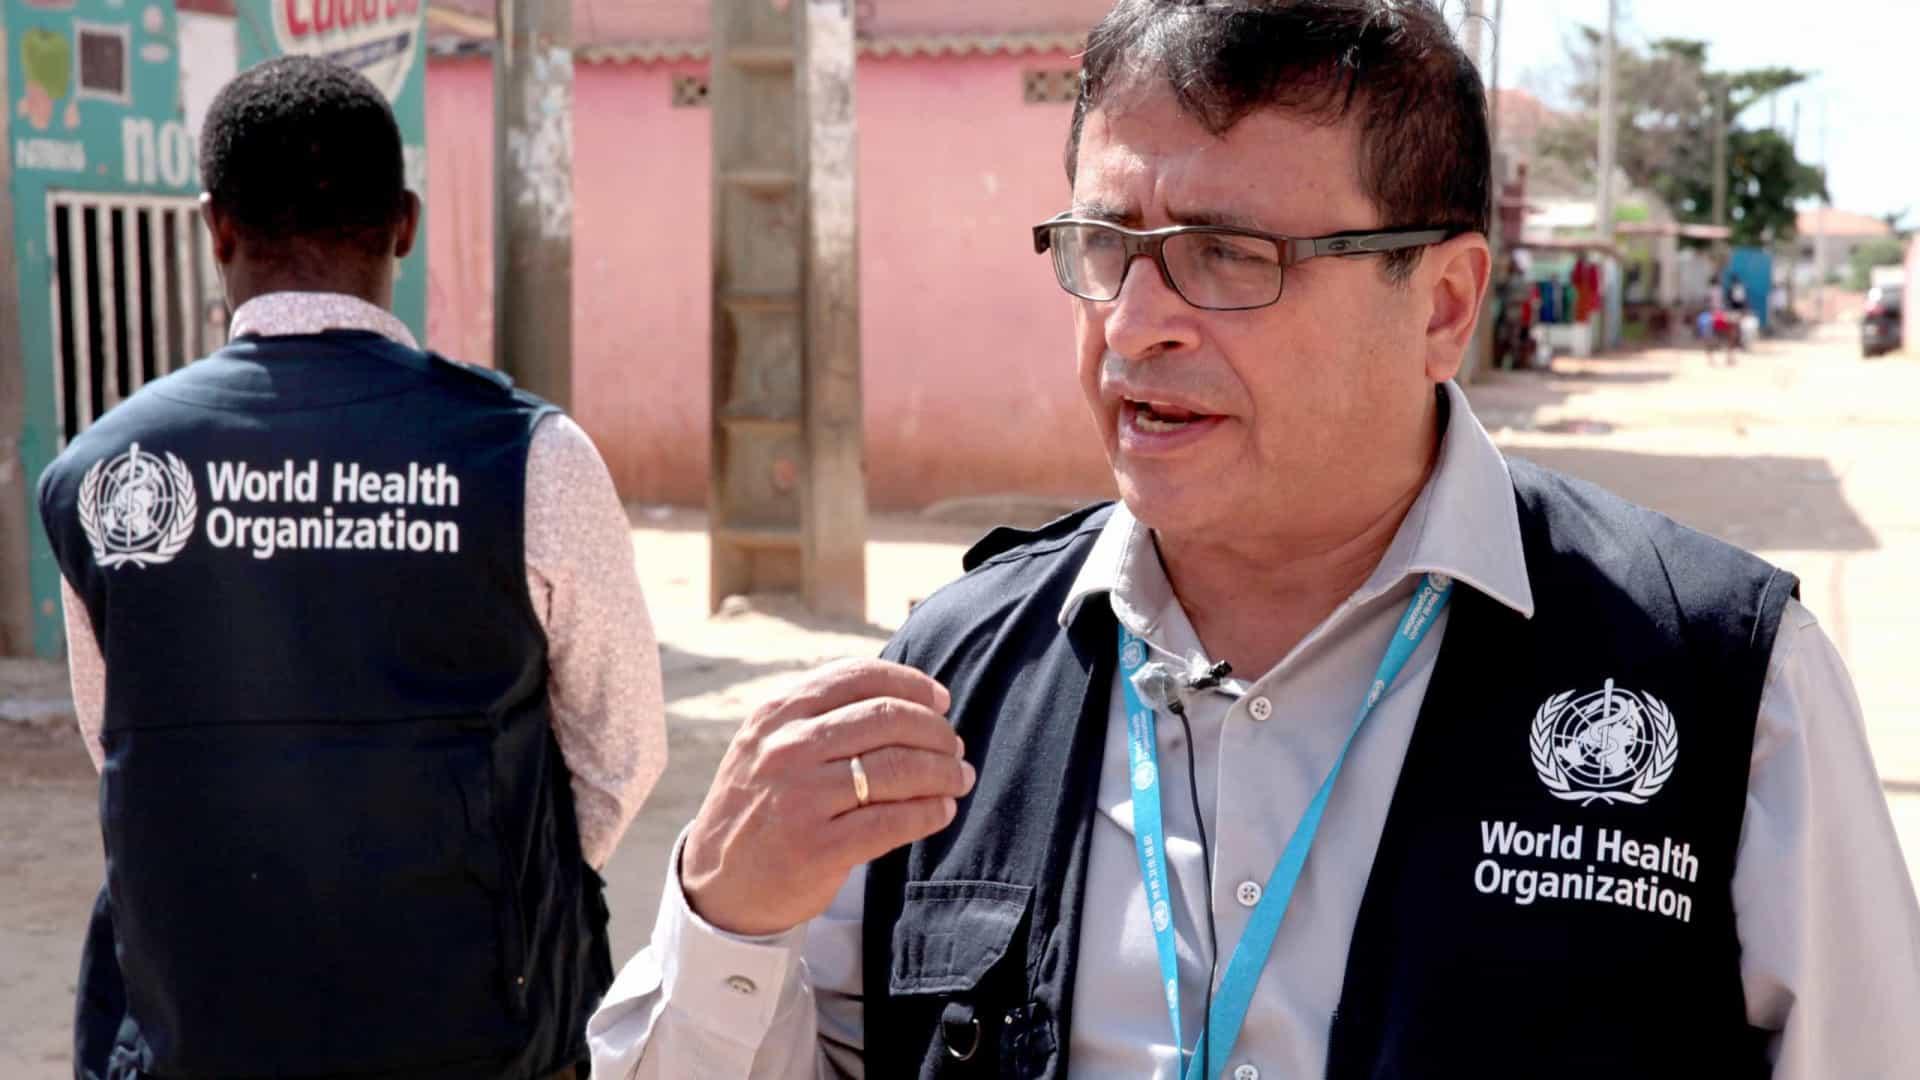 OMS apoia grupo de especialistas no interior de Angola